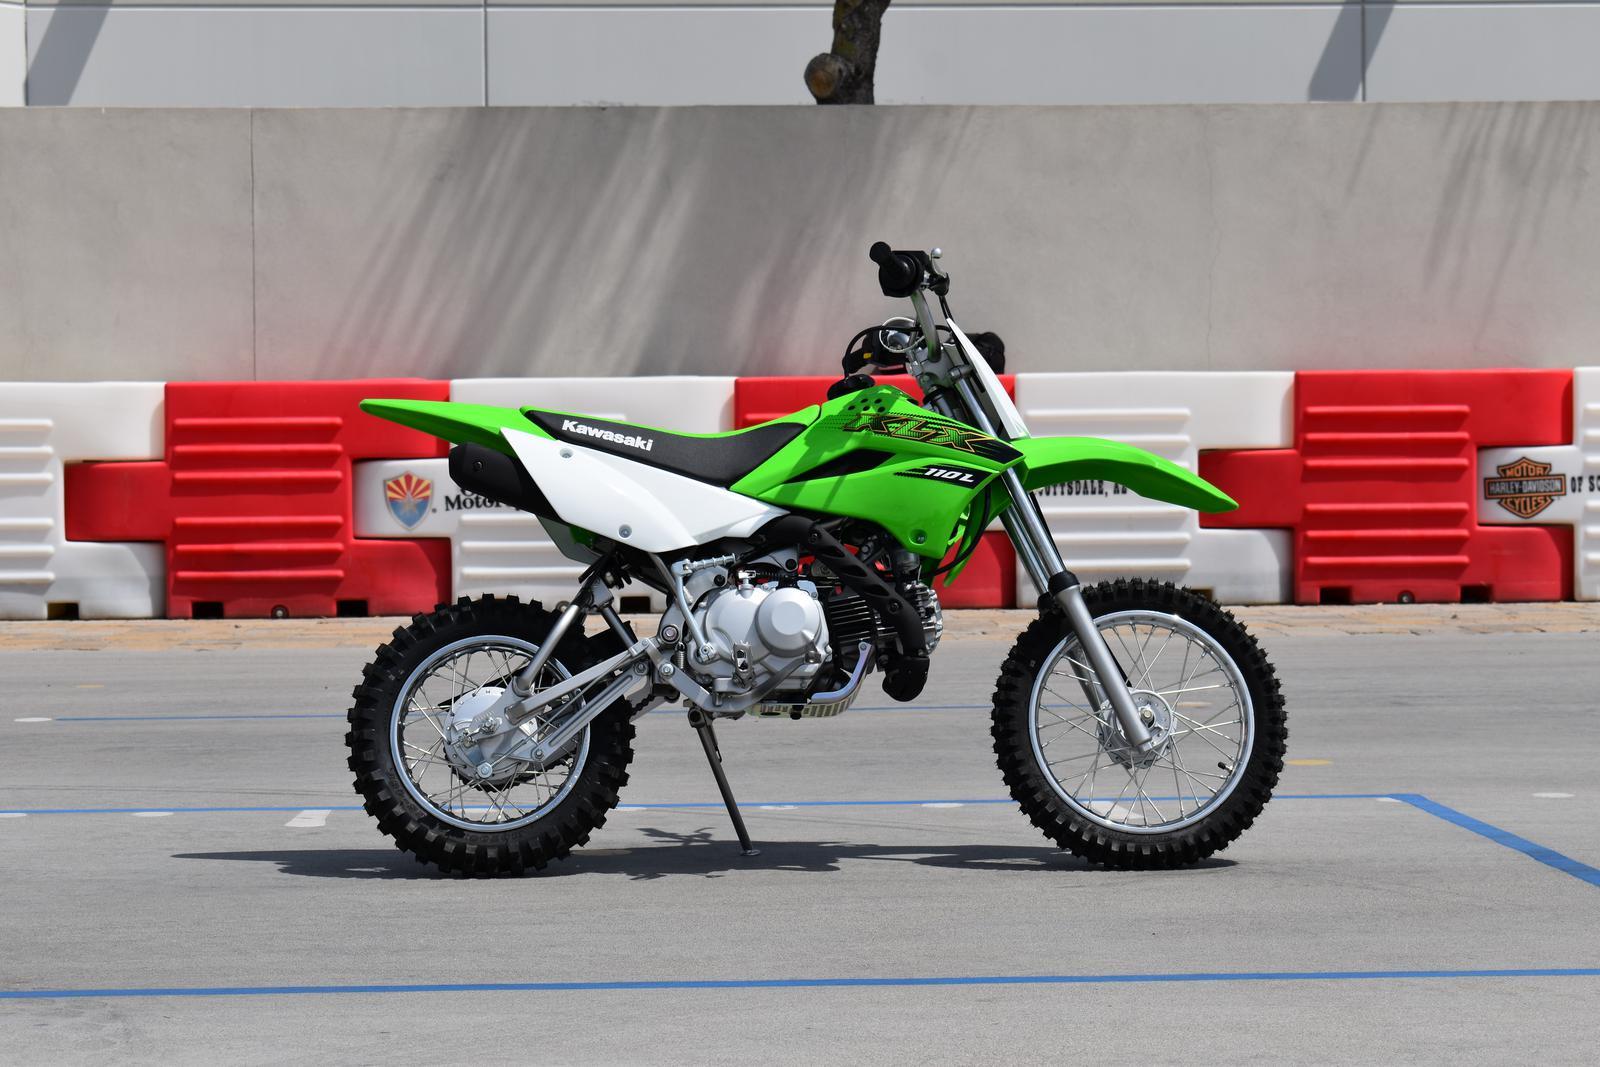 Kawasaki Dirt Bikes (480) 609-1800 from GO AZ Motorcycles